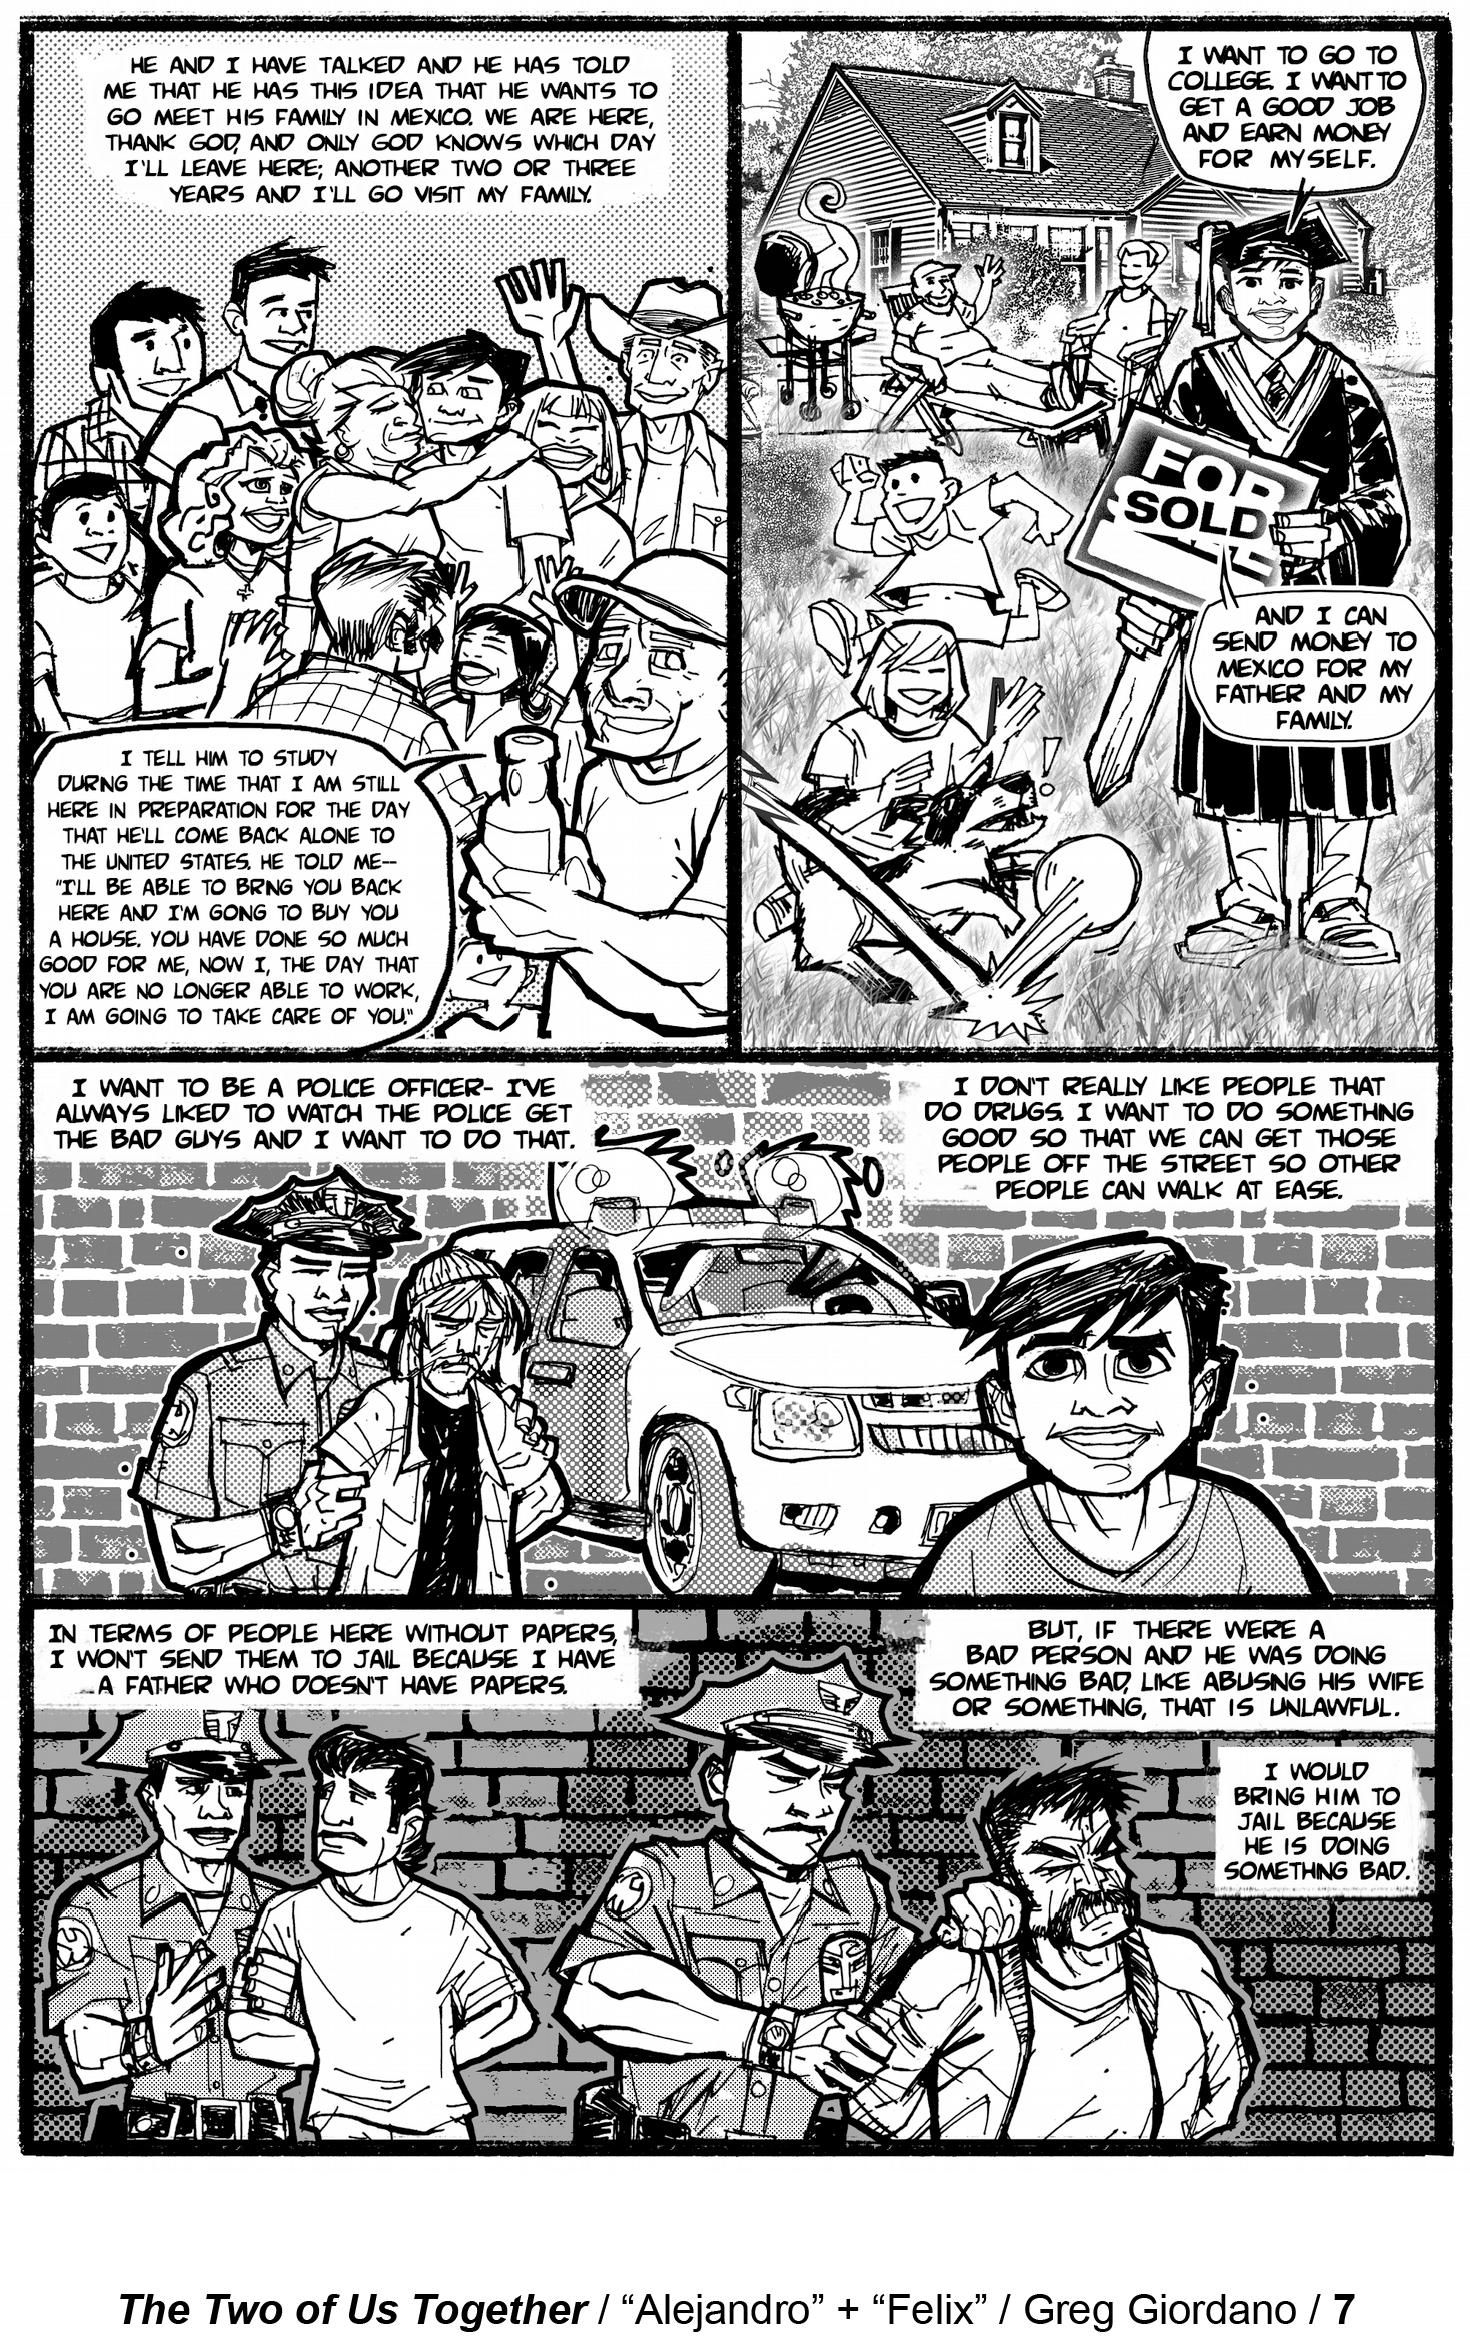 BOOKLET-Alejandro+Felix+Greg-171200-Digest_ENG 9.jpg